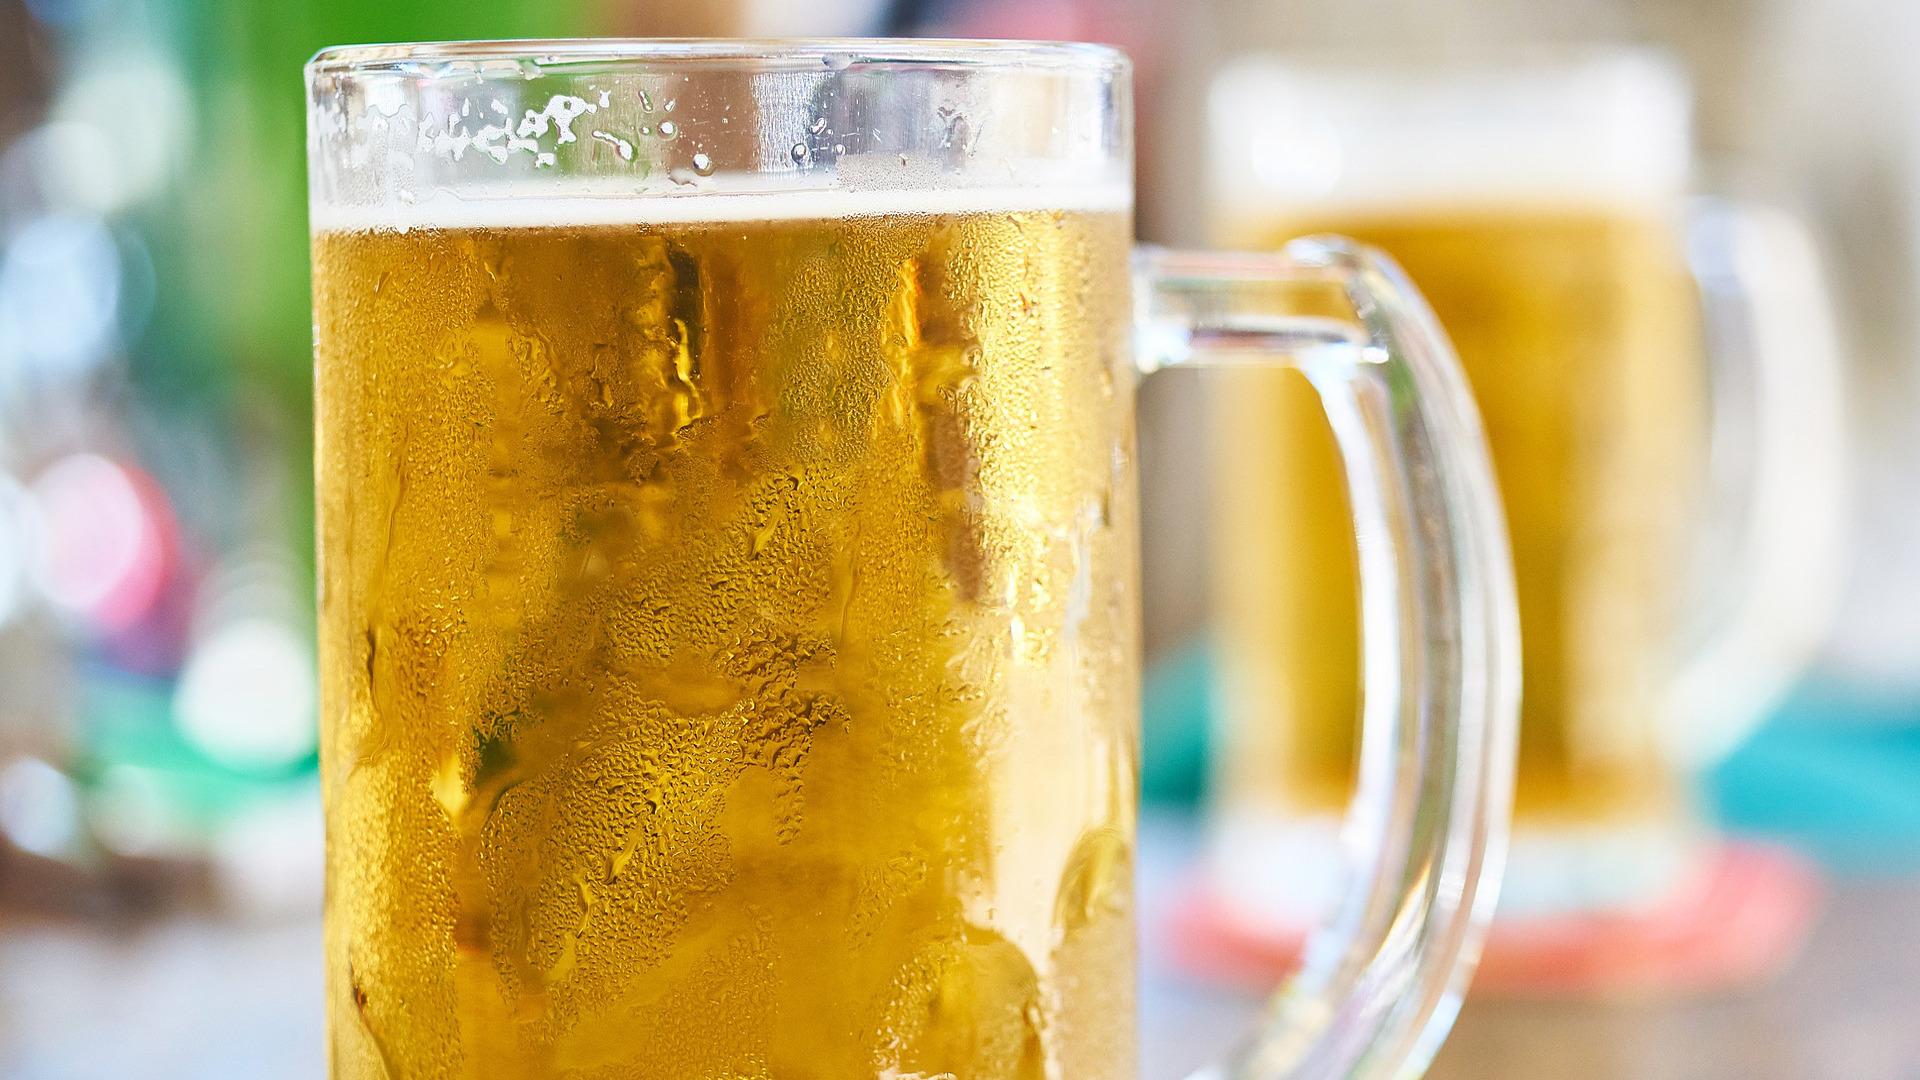 cerveza-0,0-vs-cerveza-sin-alcohol-1920